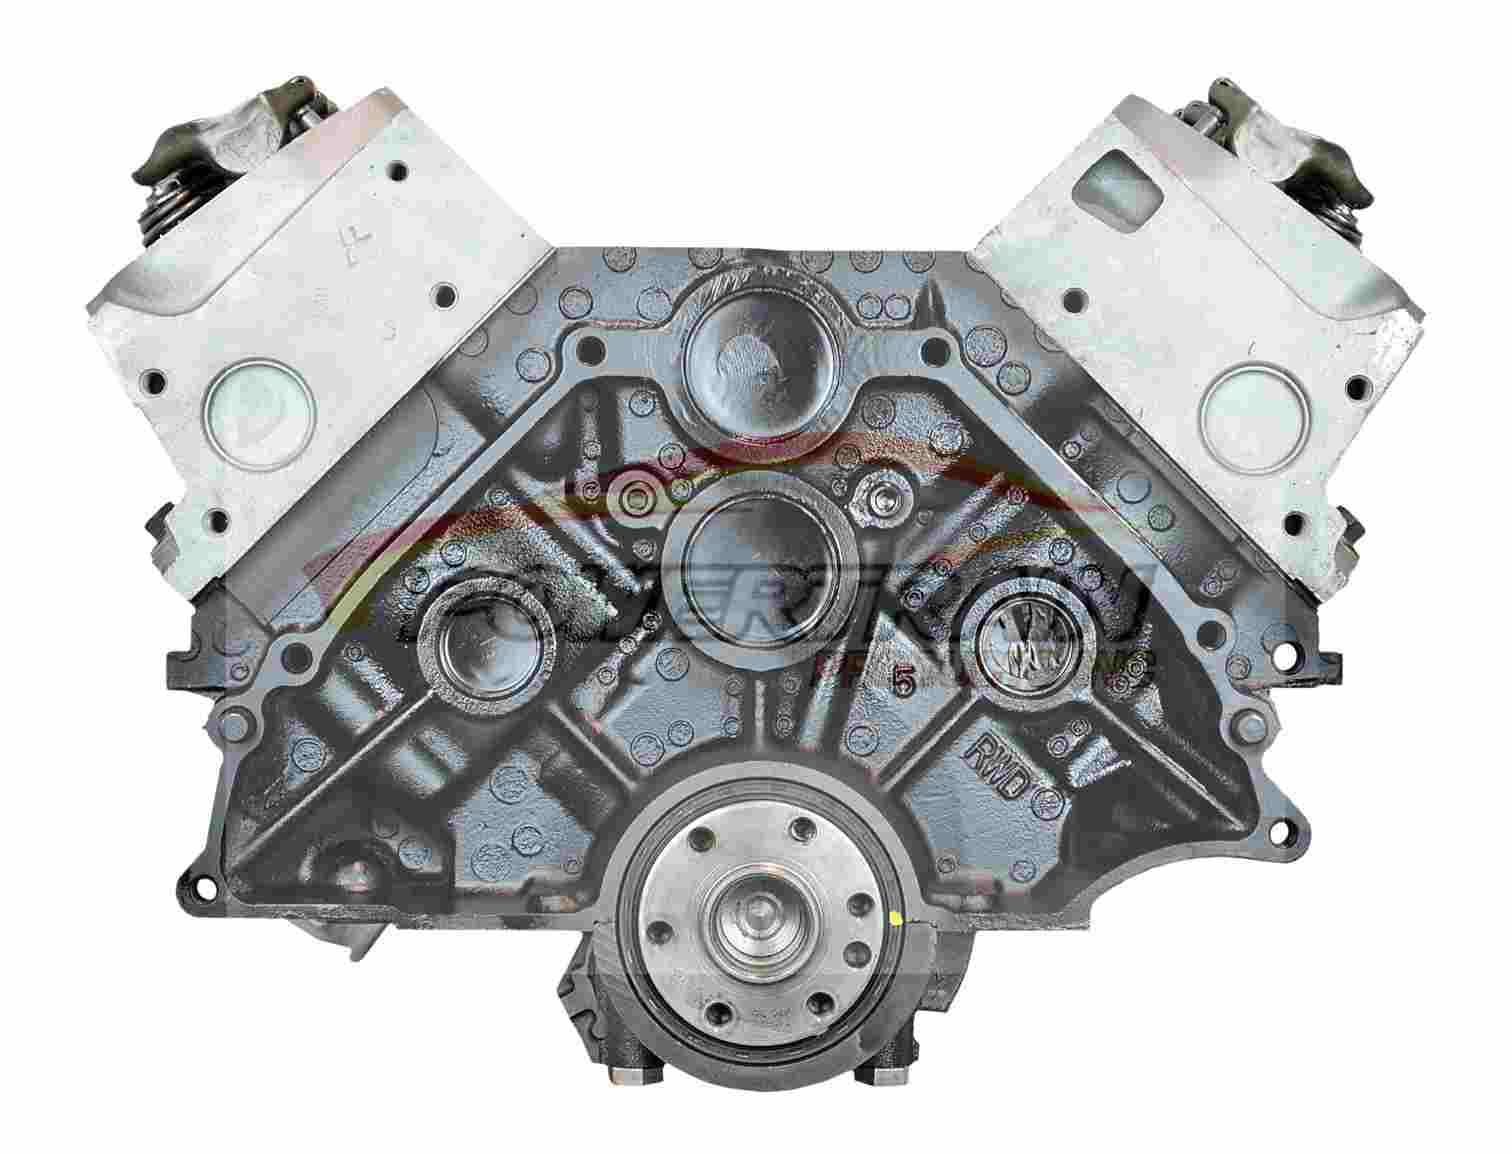 hight resolution of lx9 engine diagram